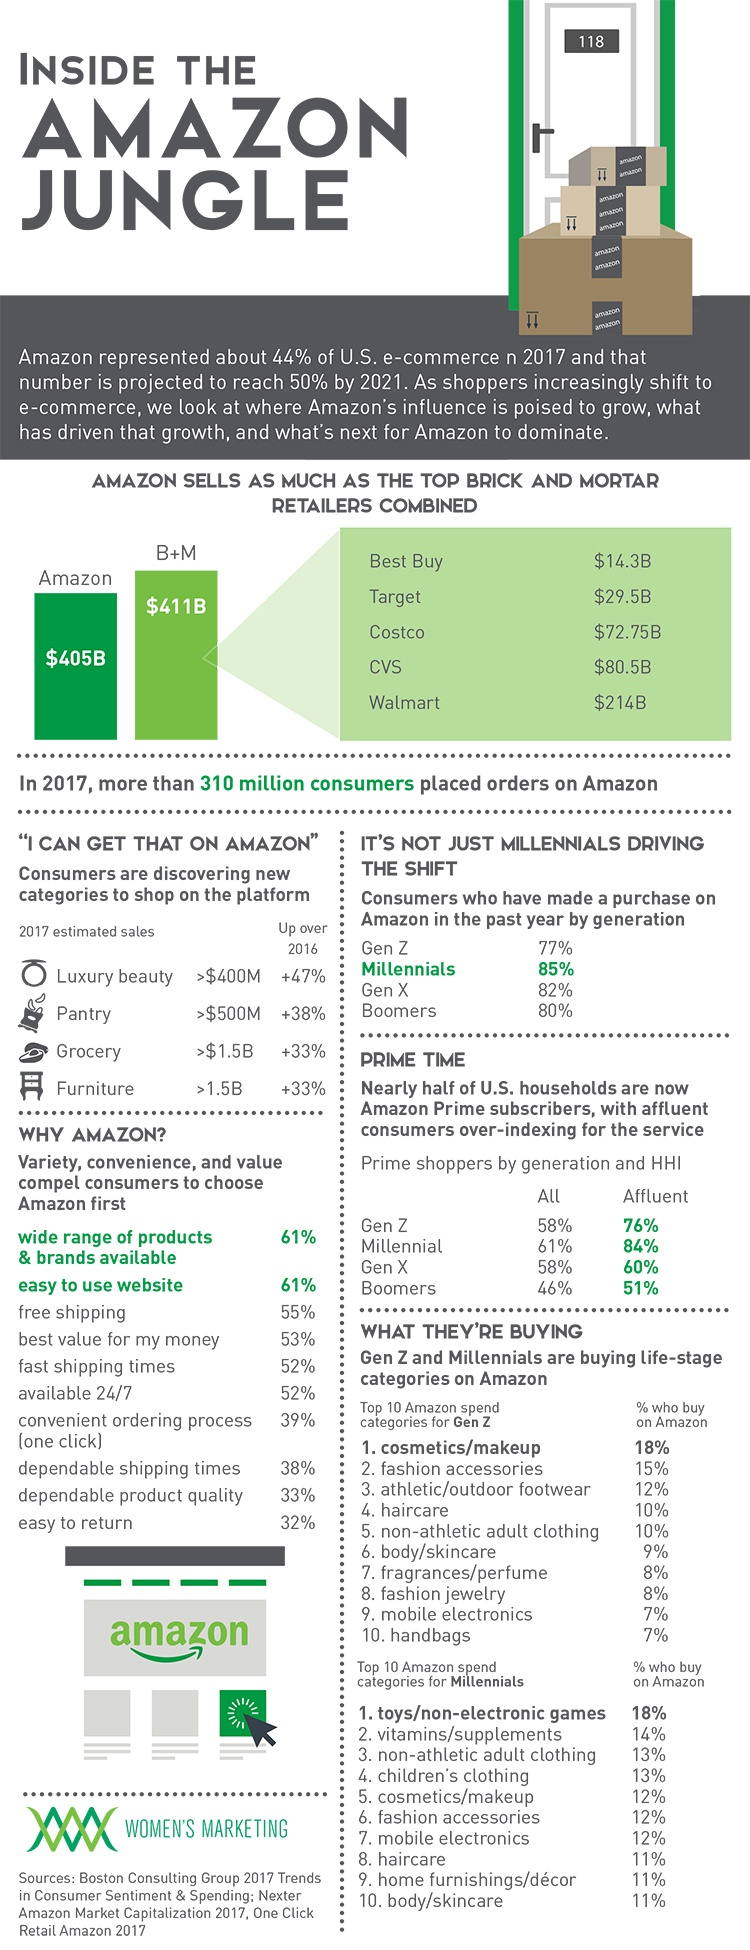 AmazonJungle_Infographic.jpg